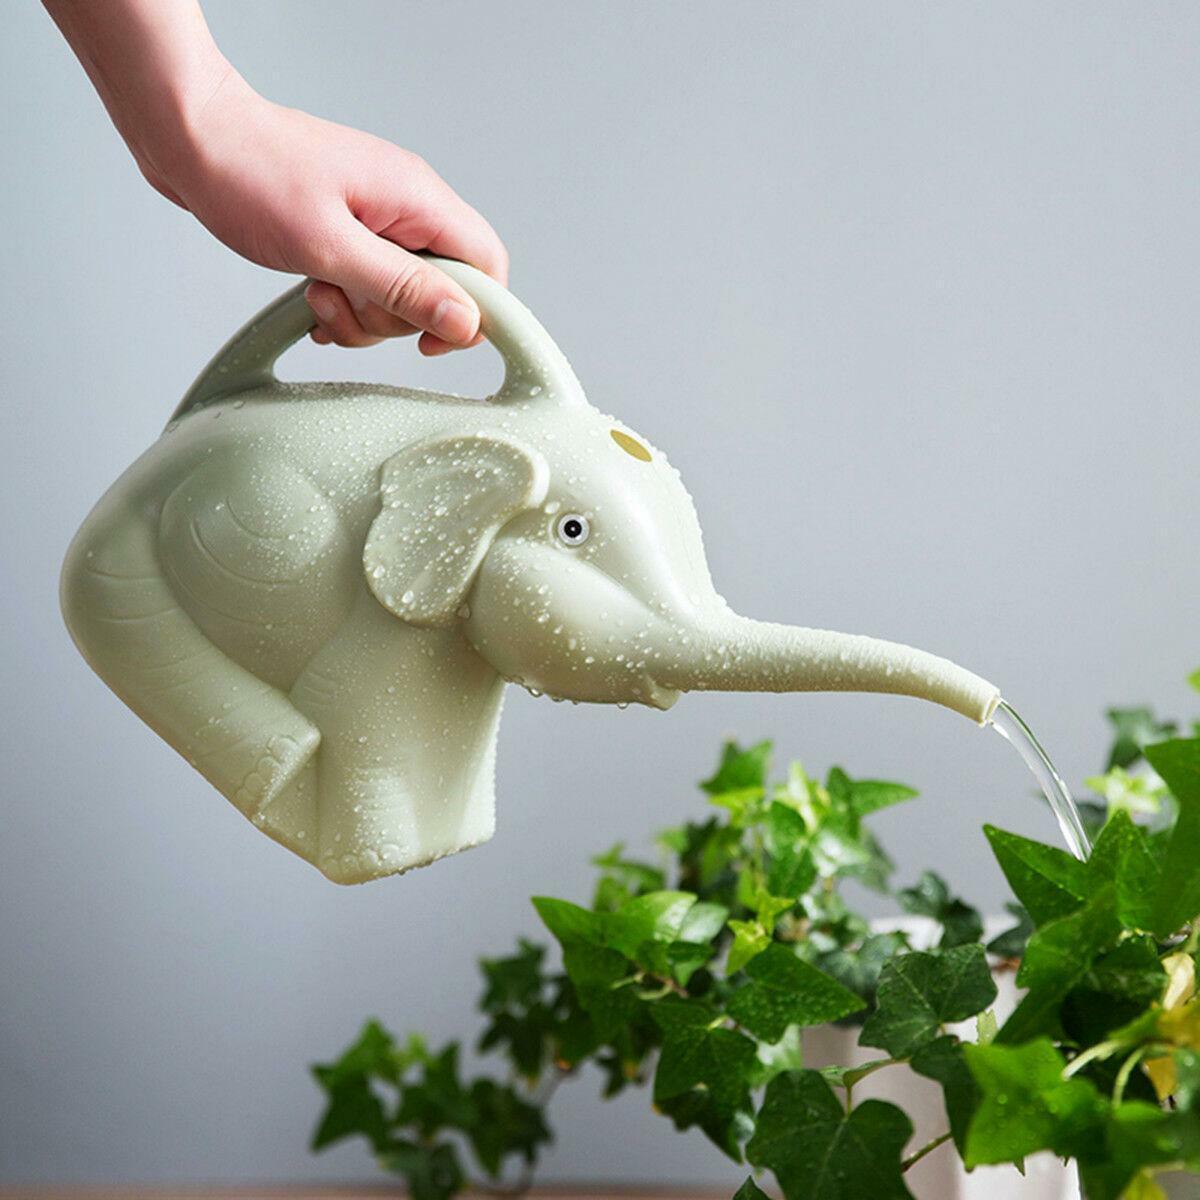 Elephant Watering Can Sprinkler Garden Greenhouse Home Indoor Plants Sprinkler